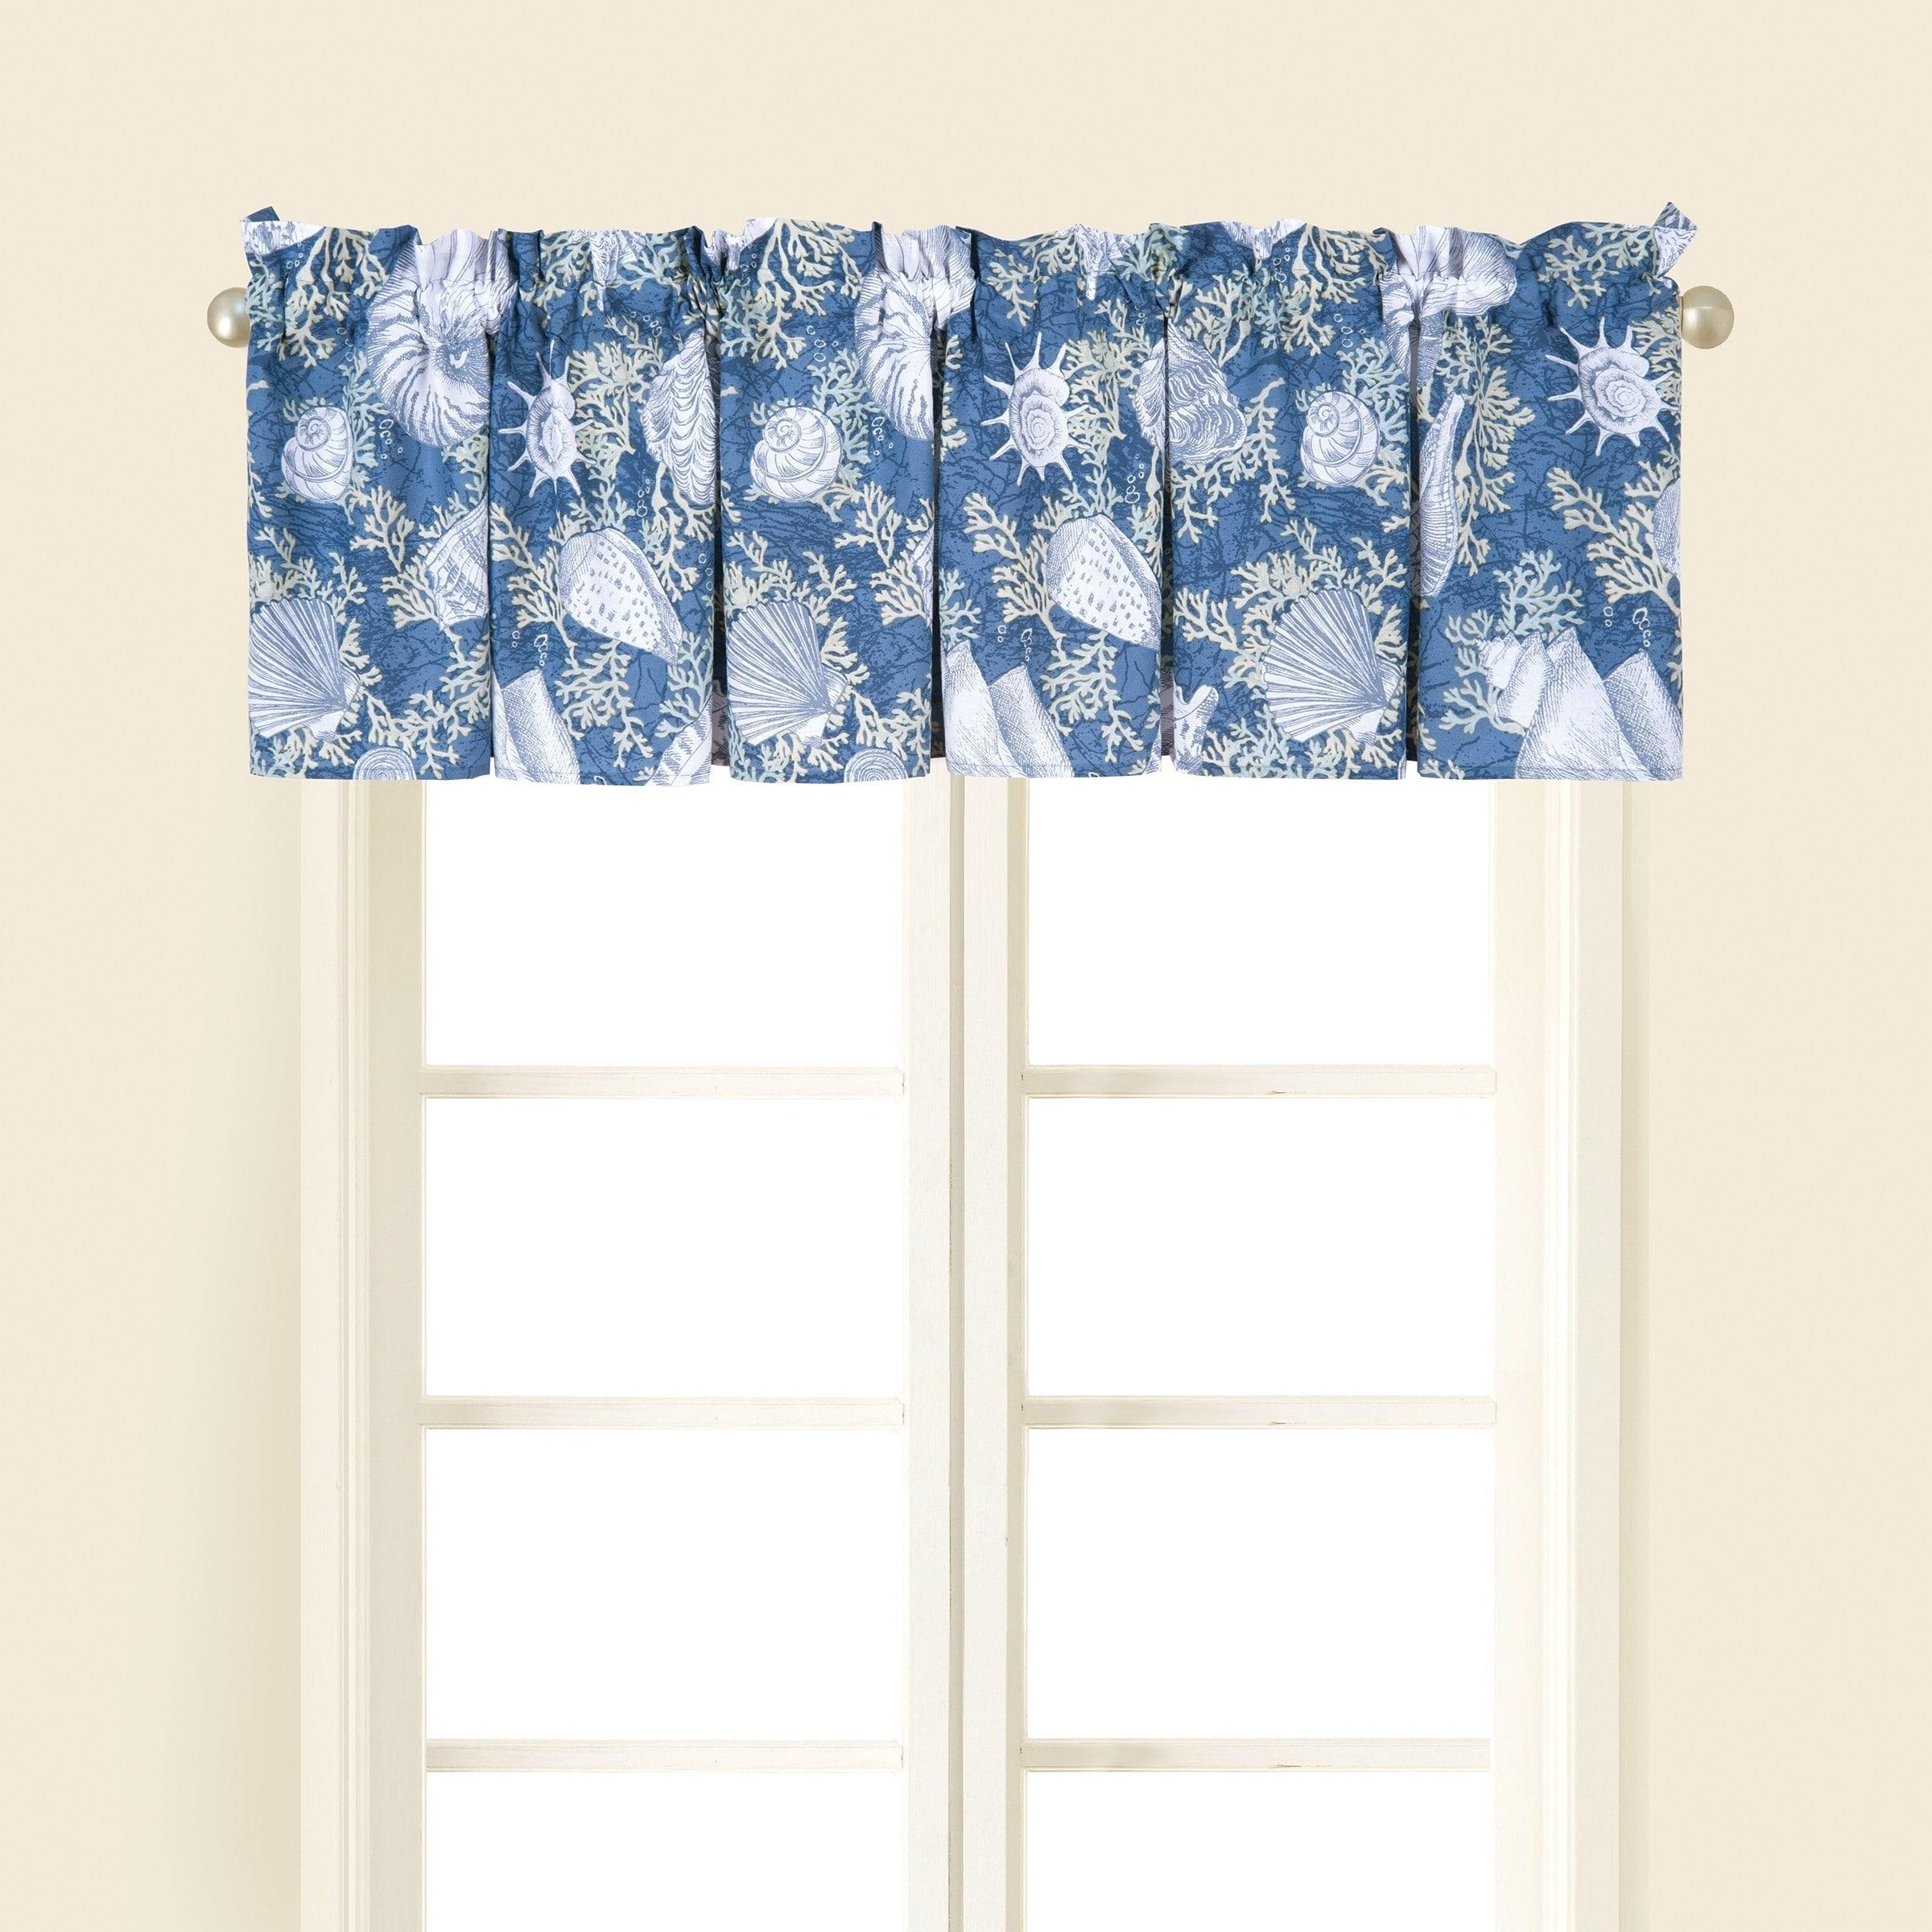 Seashell Coastal Tier and Valance Window Curtain Set 58x36